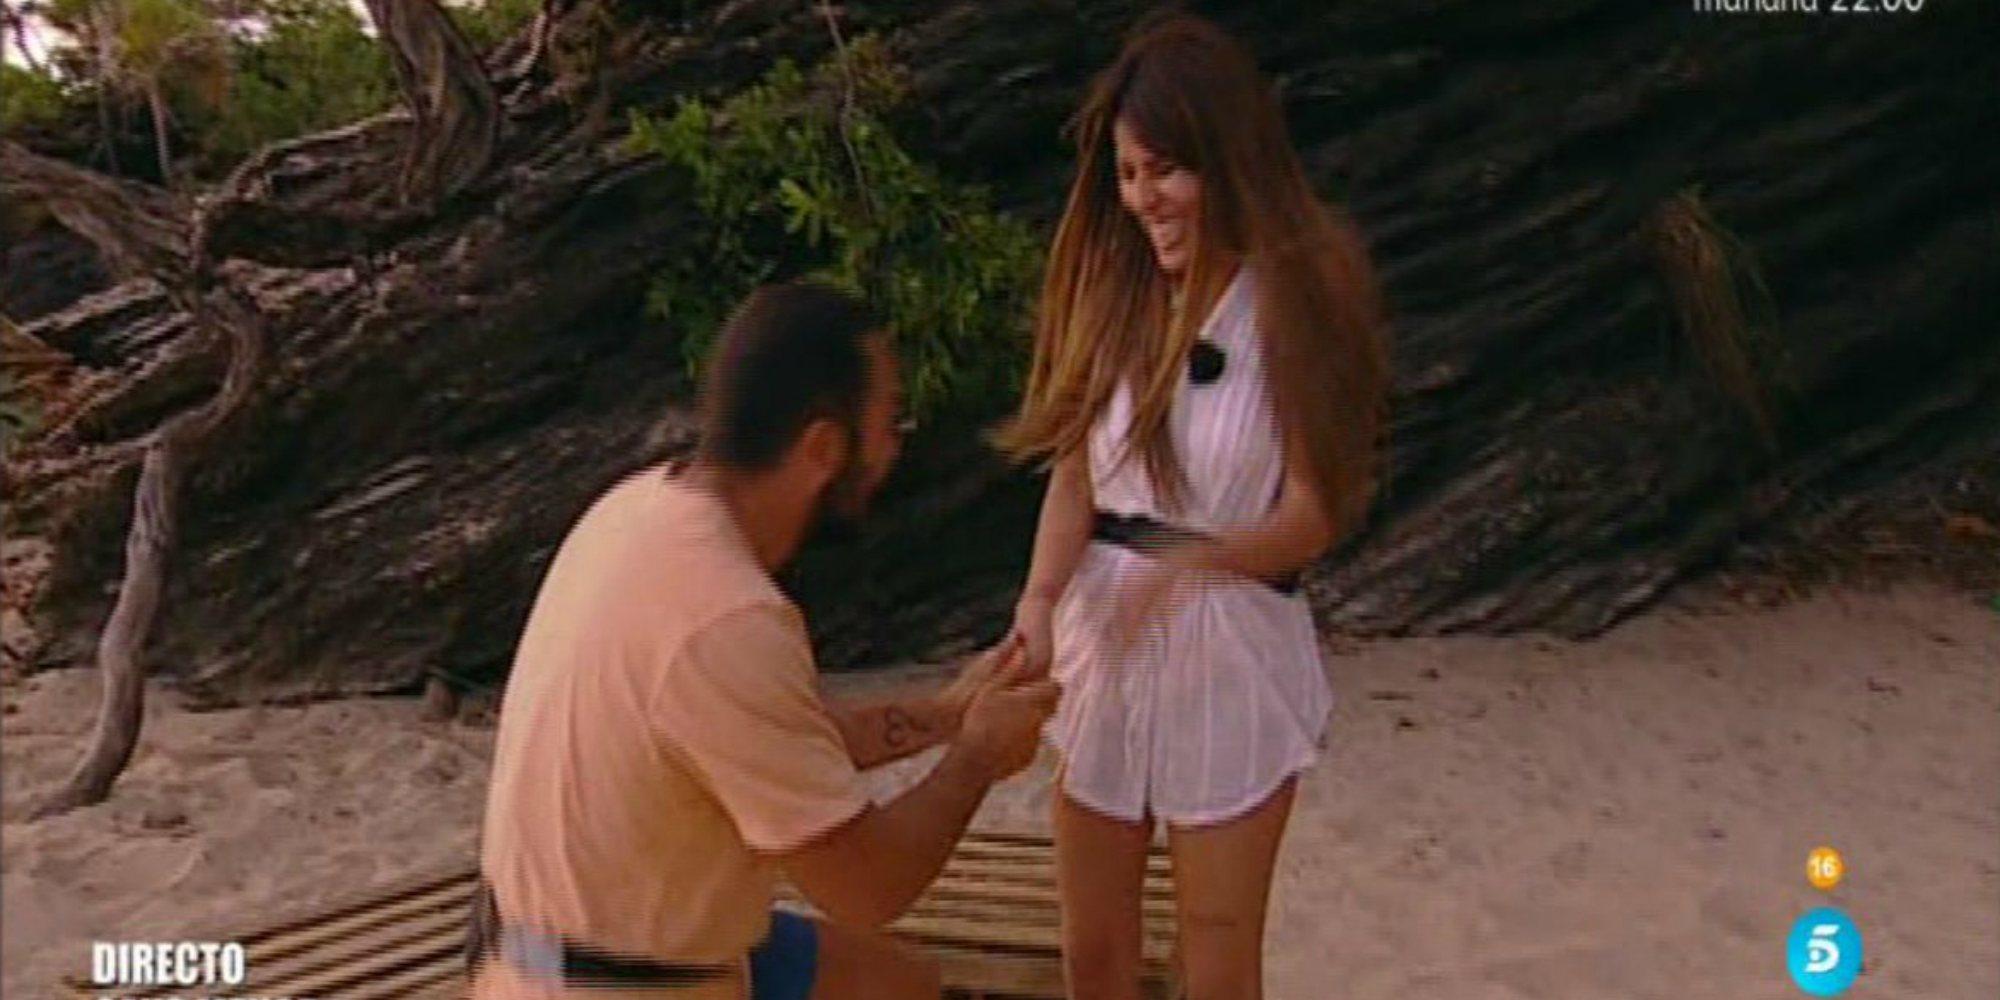 Alberto Isla le pide matrimonio a Chabelita Pantoja en 'Supervivientes 2018'